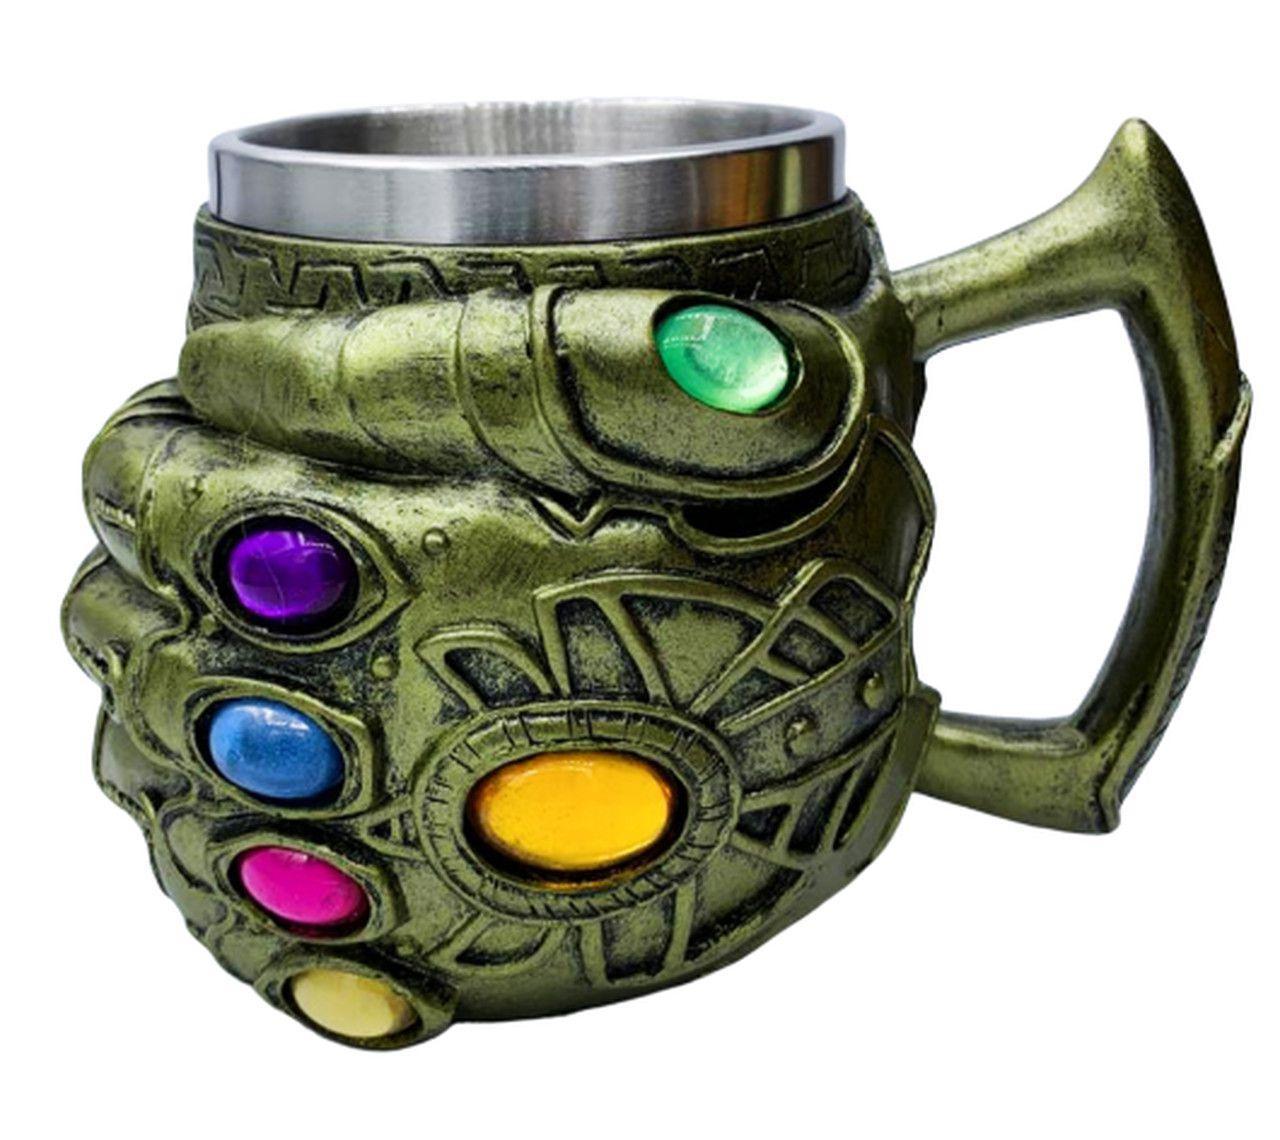 Caneca 3D Manopla do Infinito (Infinity Gauntlet) ''Thanos'': Vingadores Guerra Infinita (Avengers Infinity War)